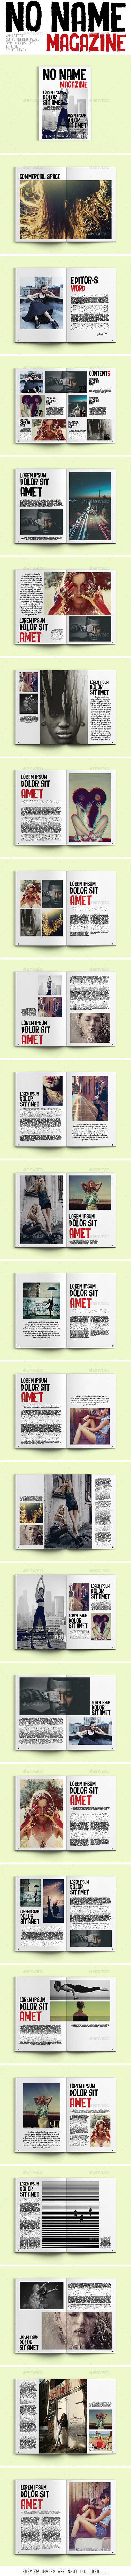 No Name Magazine - Magazines Print Templates